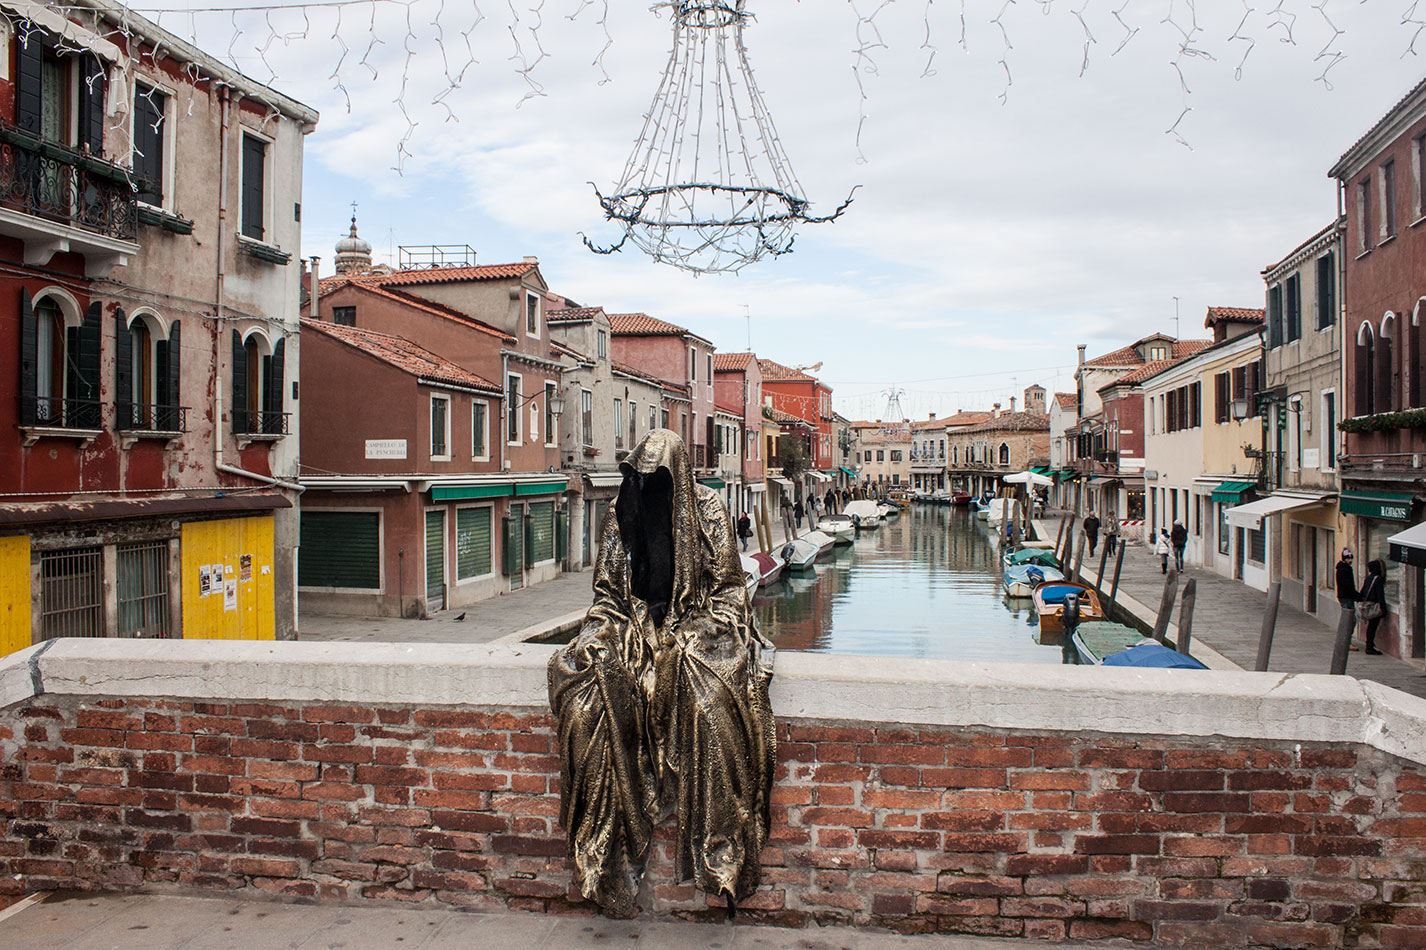 Italia-Venice-Murano-Berengo-glas-studio-glasstress-guardians-of-time-by-Manfred-Kili-Kielnhofer-contemporary-art-design-show-7166